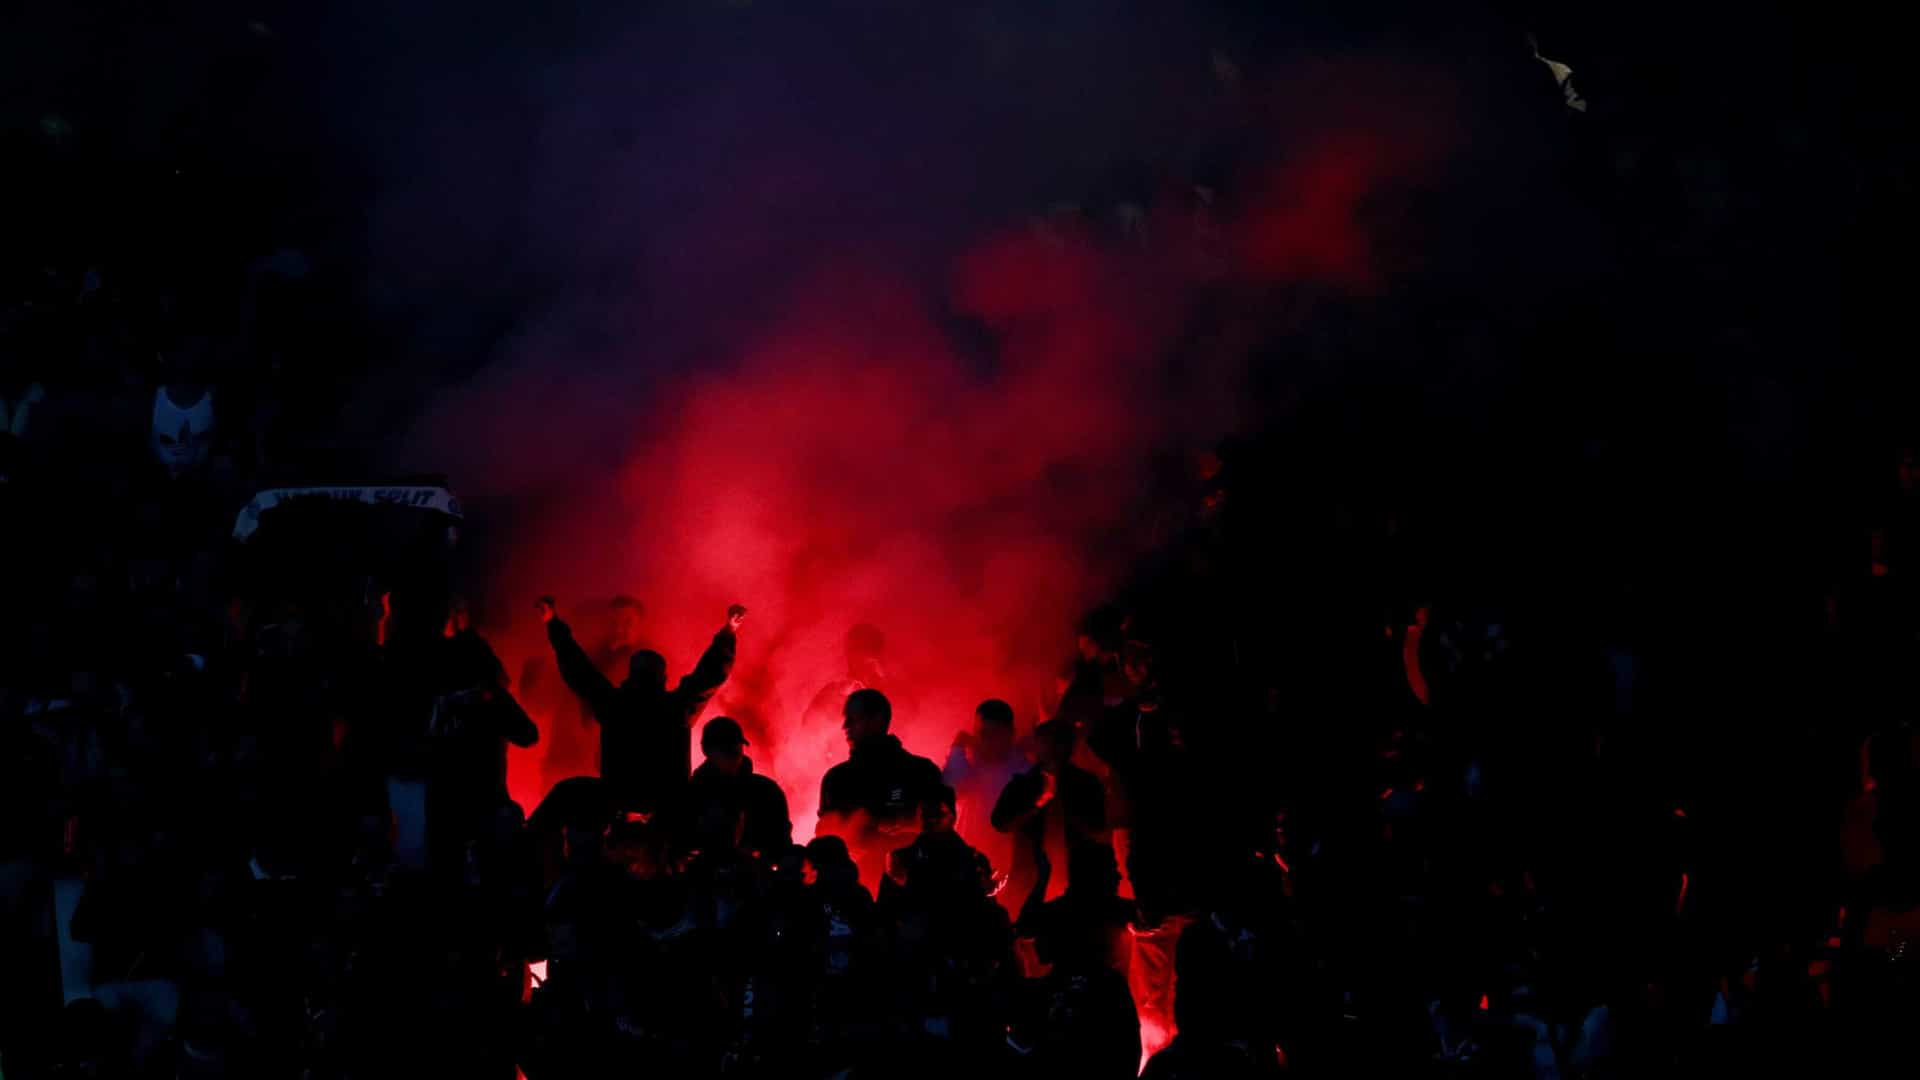 UEFA abre processo disciplinar ao Benfica